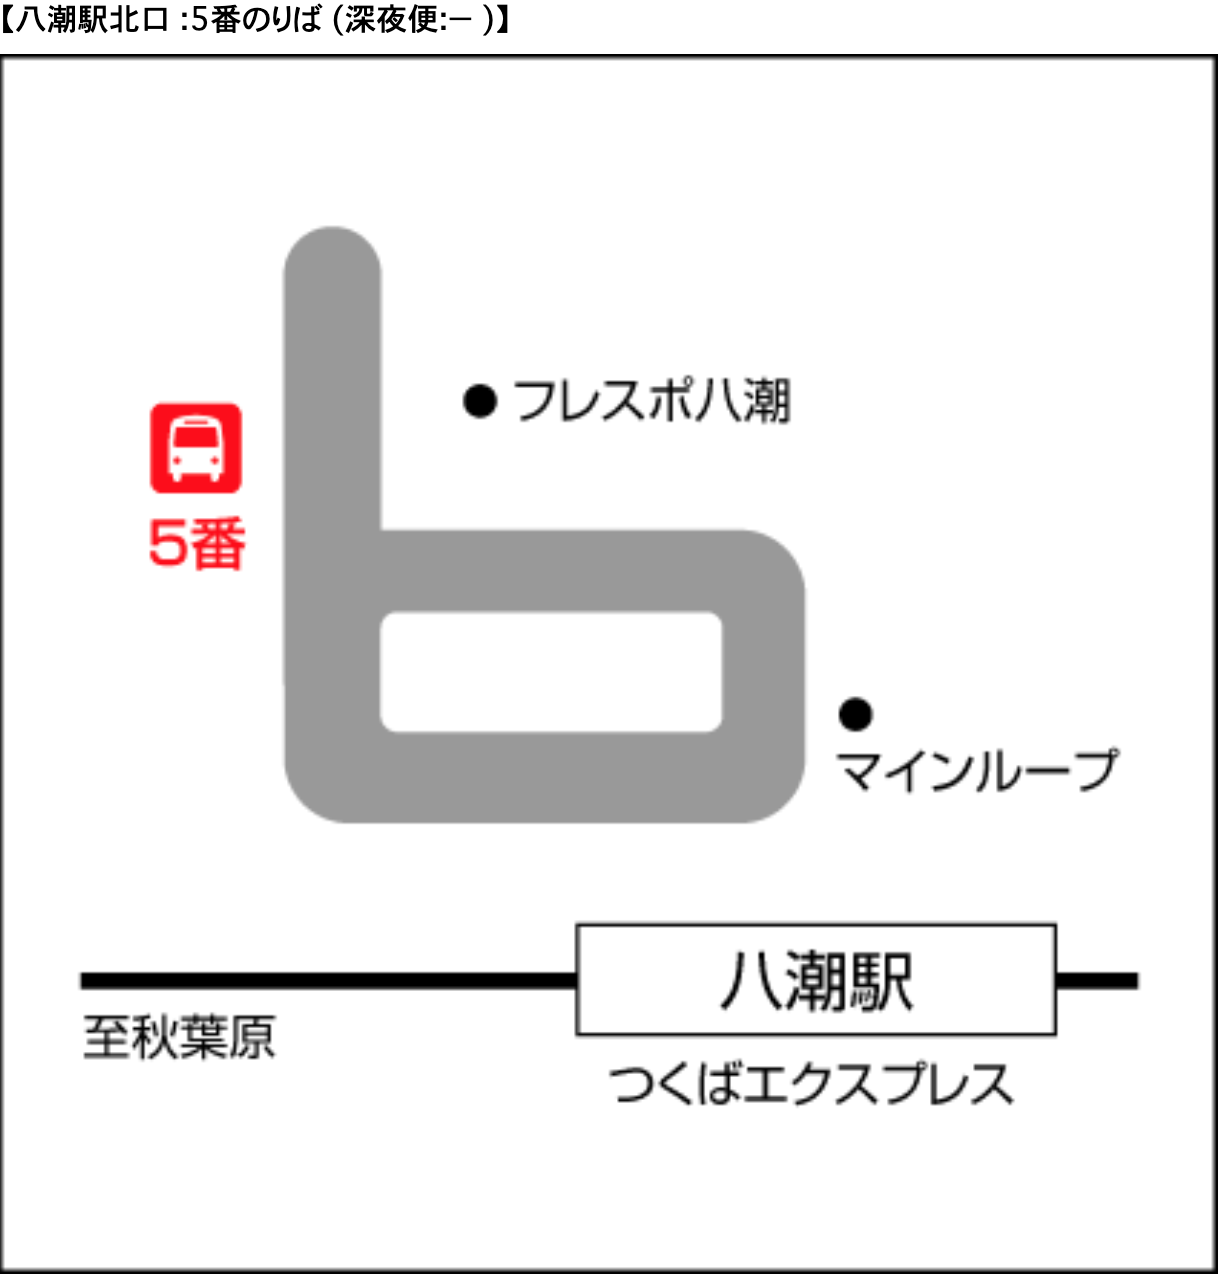 空港バス 八潮駅 案内図